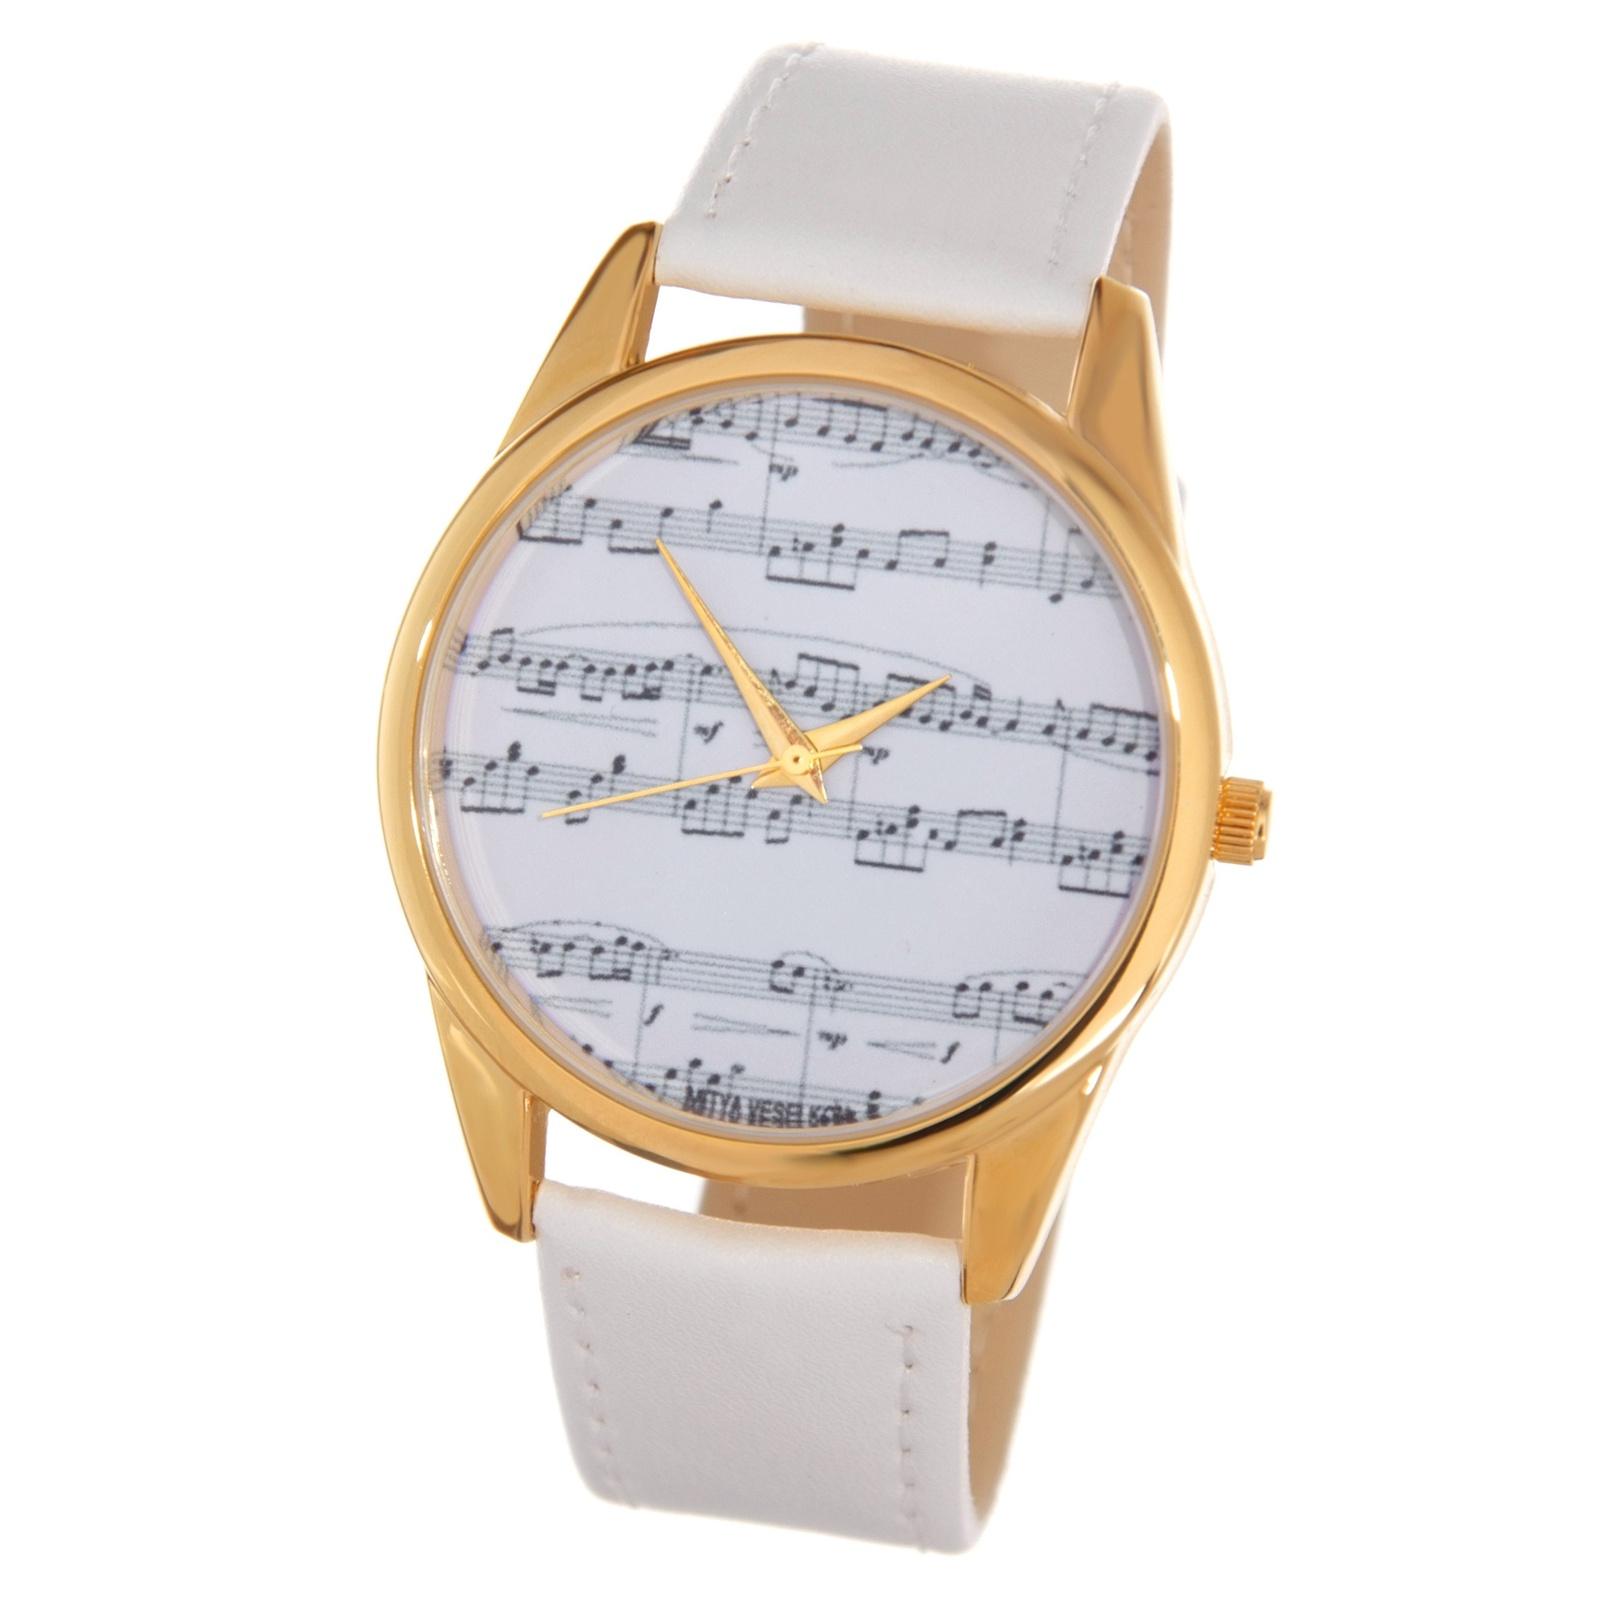 Наручные часы Mitya Veselkov Shine09 цена и фото